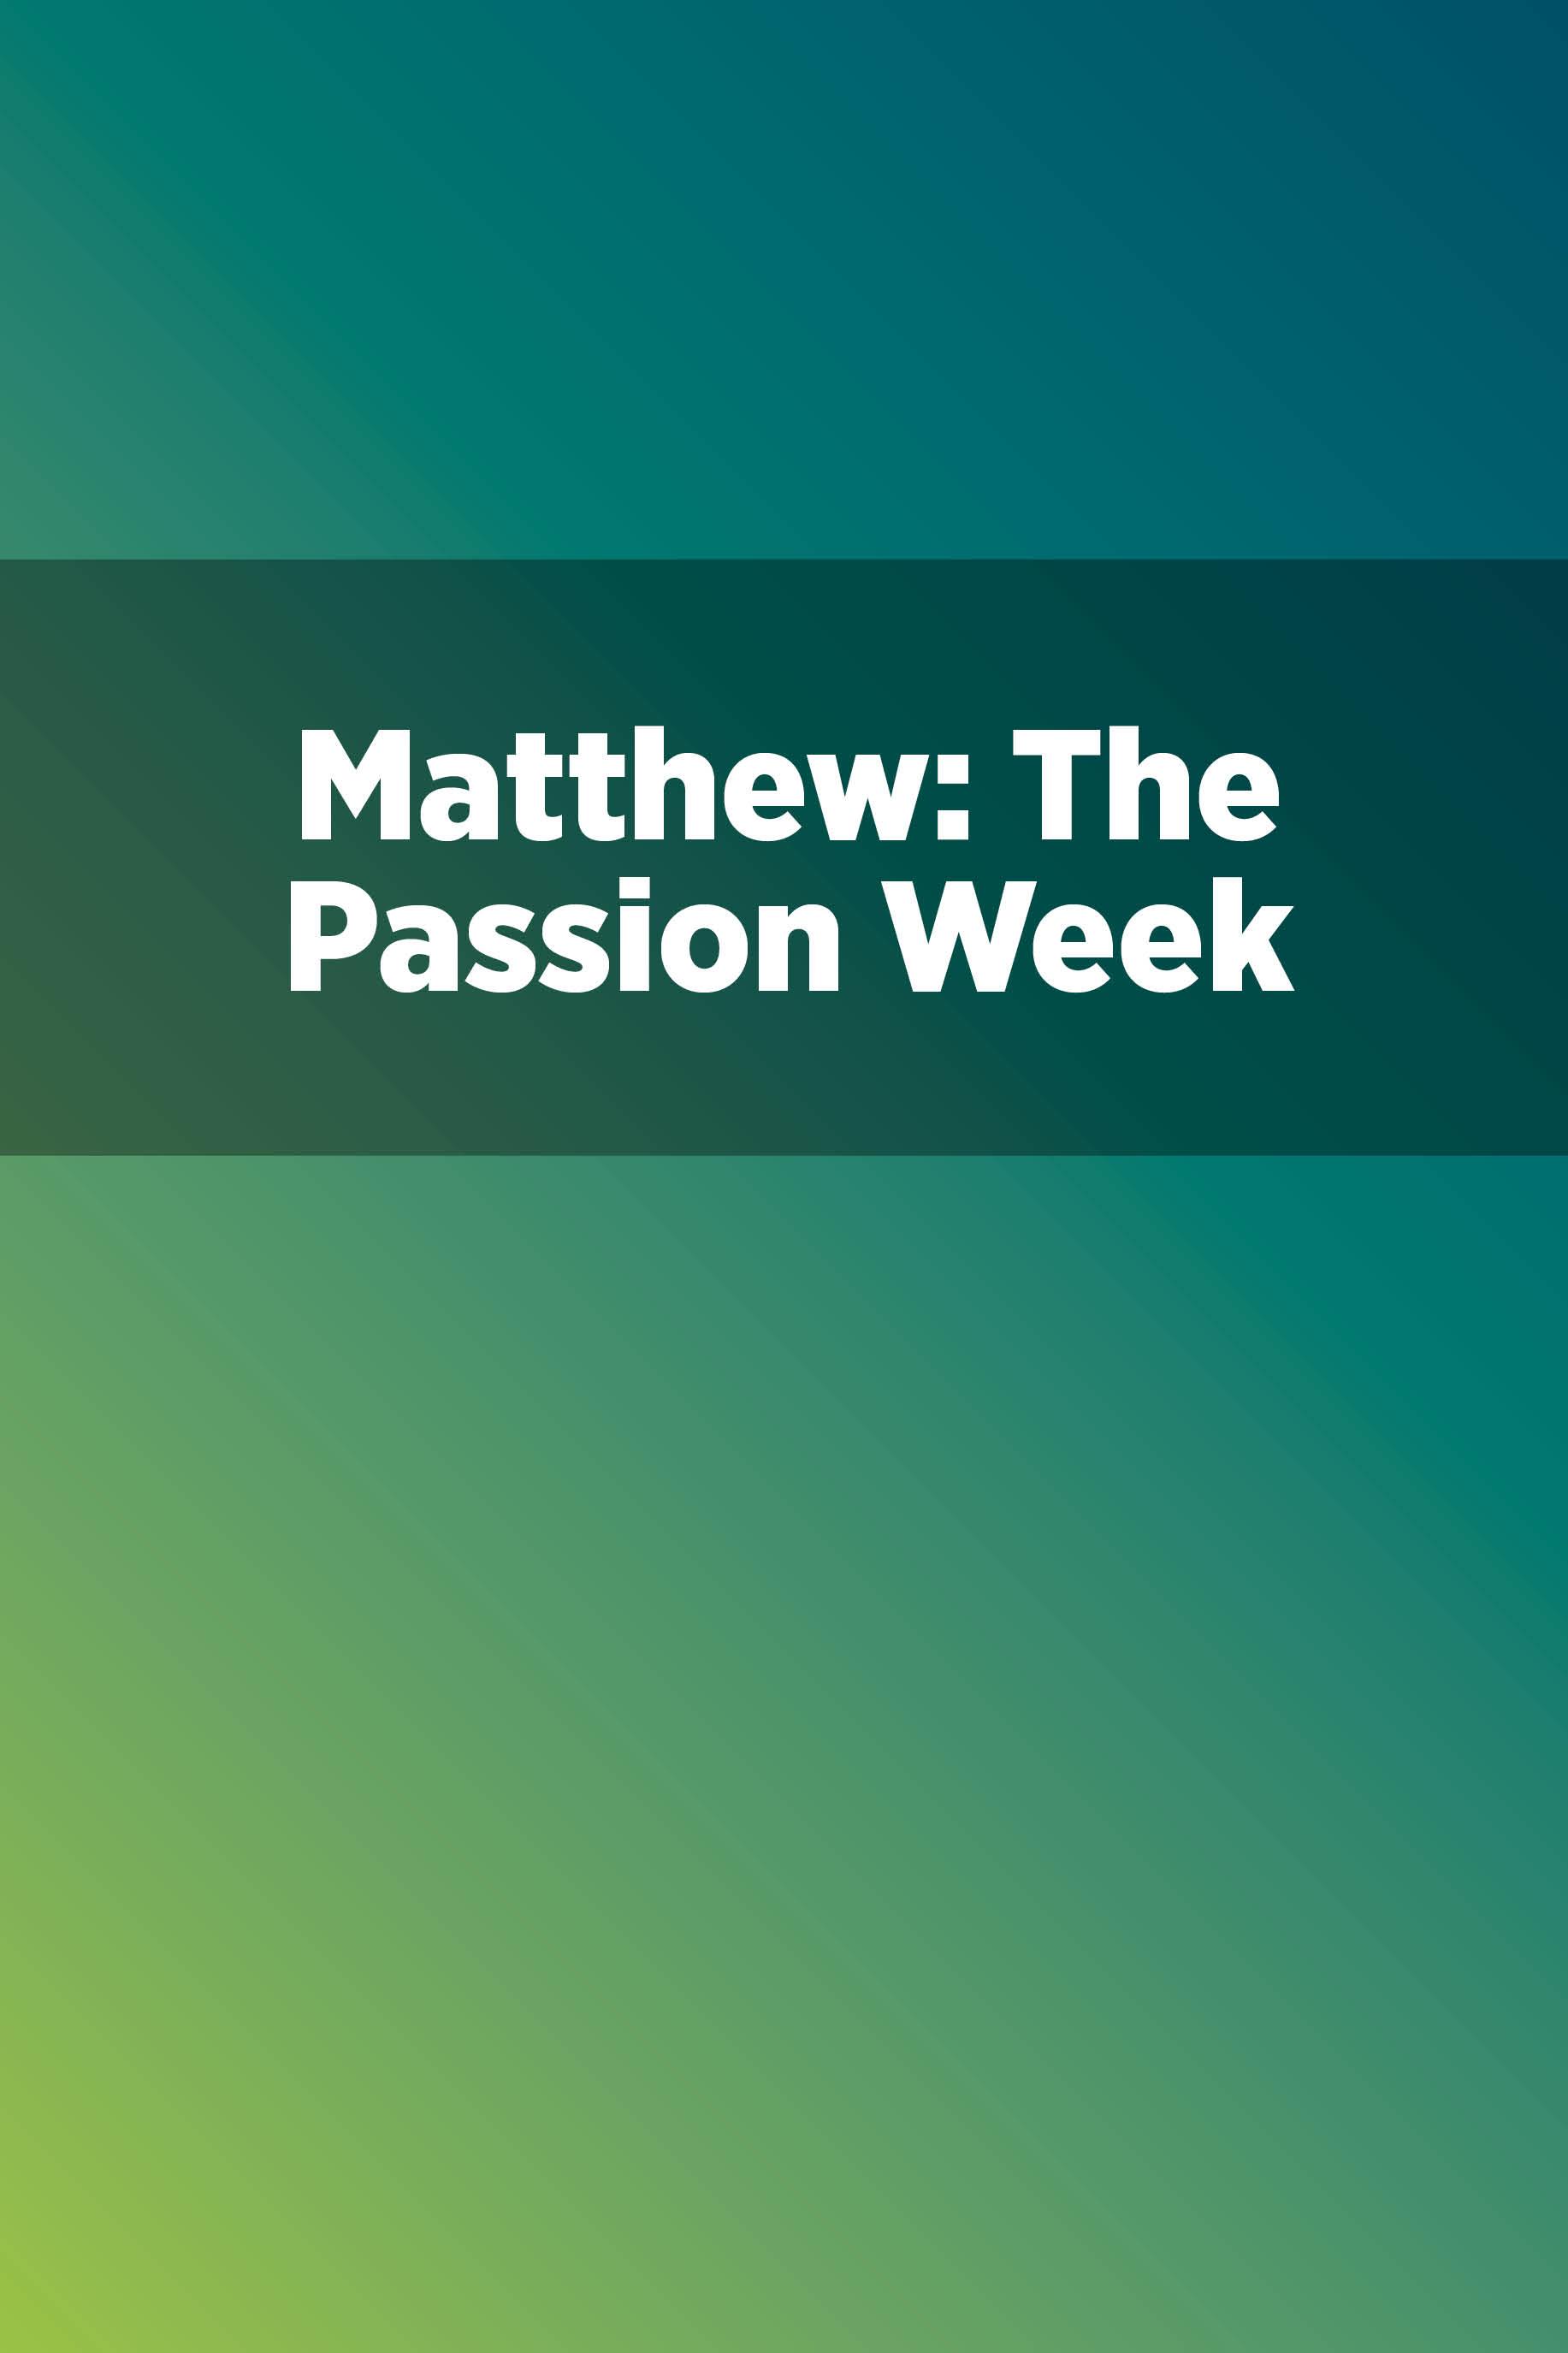 Matthew: The Passion Week